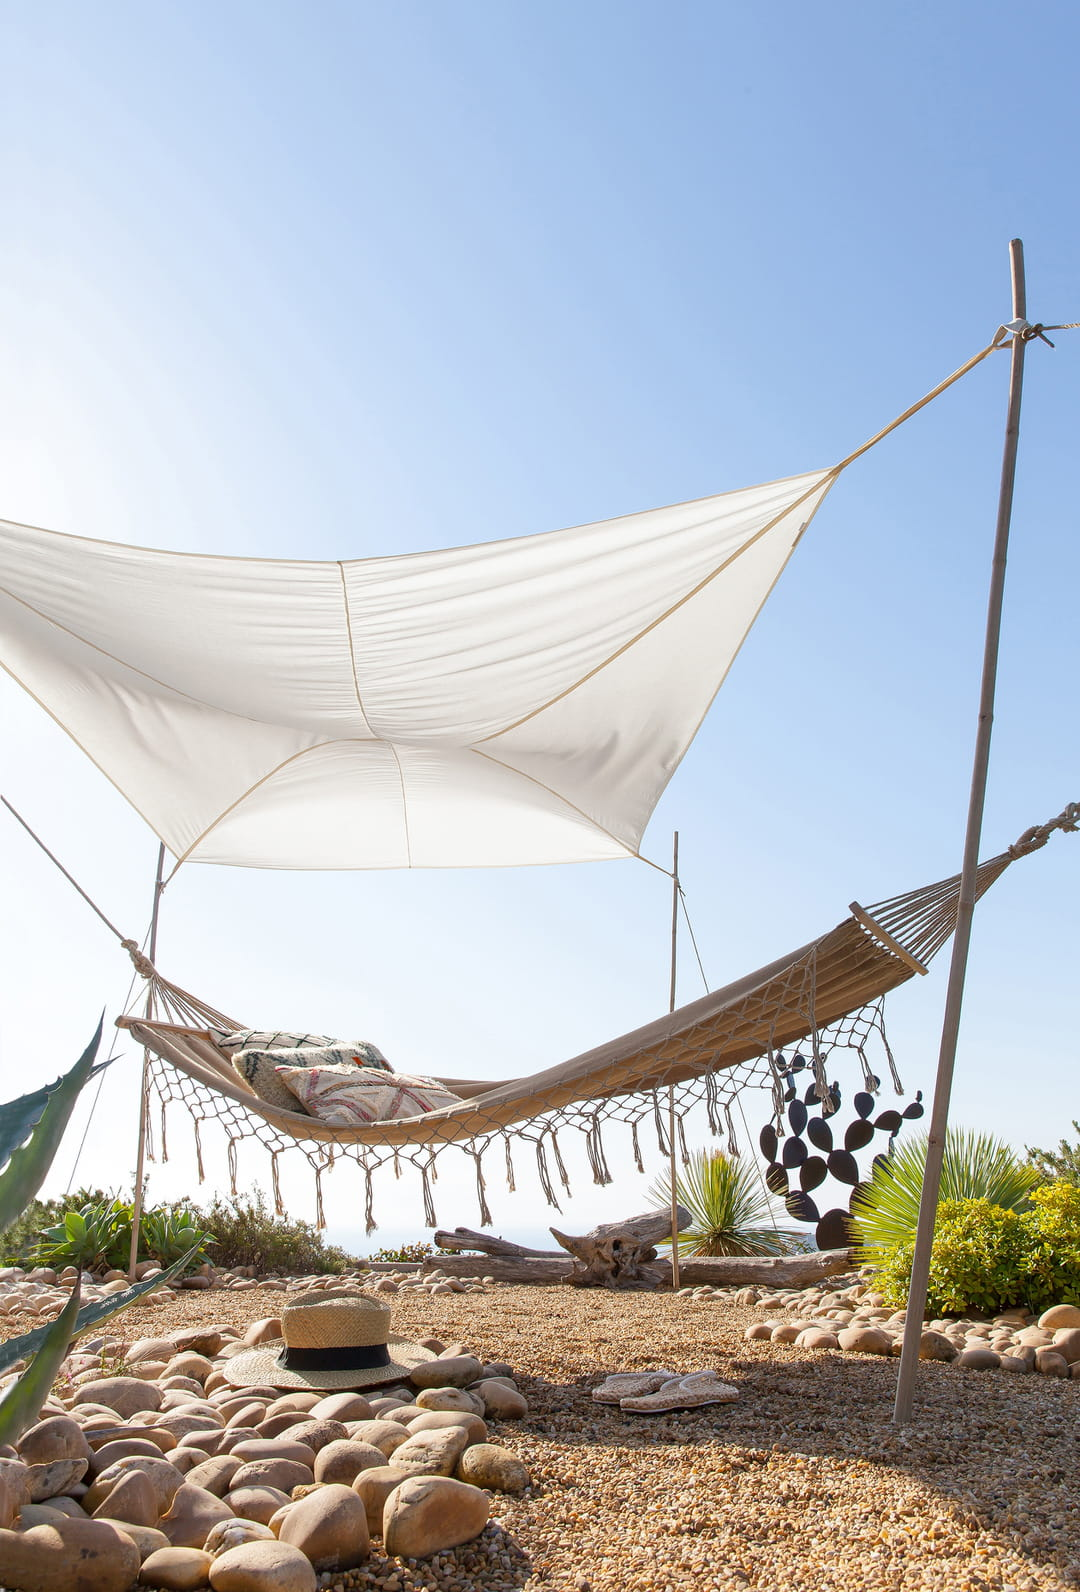 comment se prot ger du soleil au jardin ou sur la terrasse. Black Bedroom Furniture Sets. Home Design Ideas